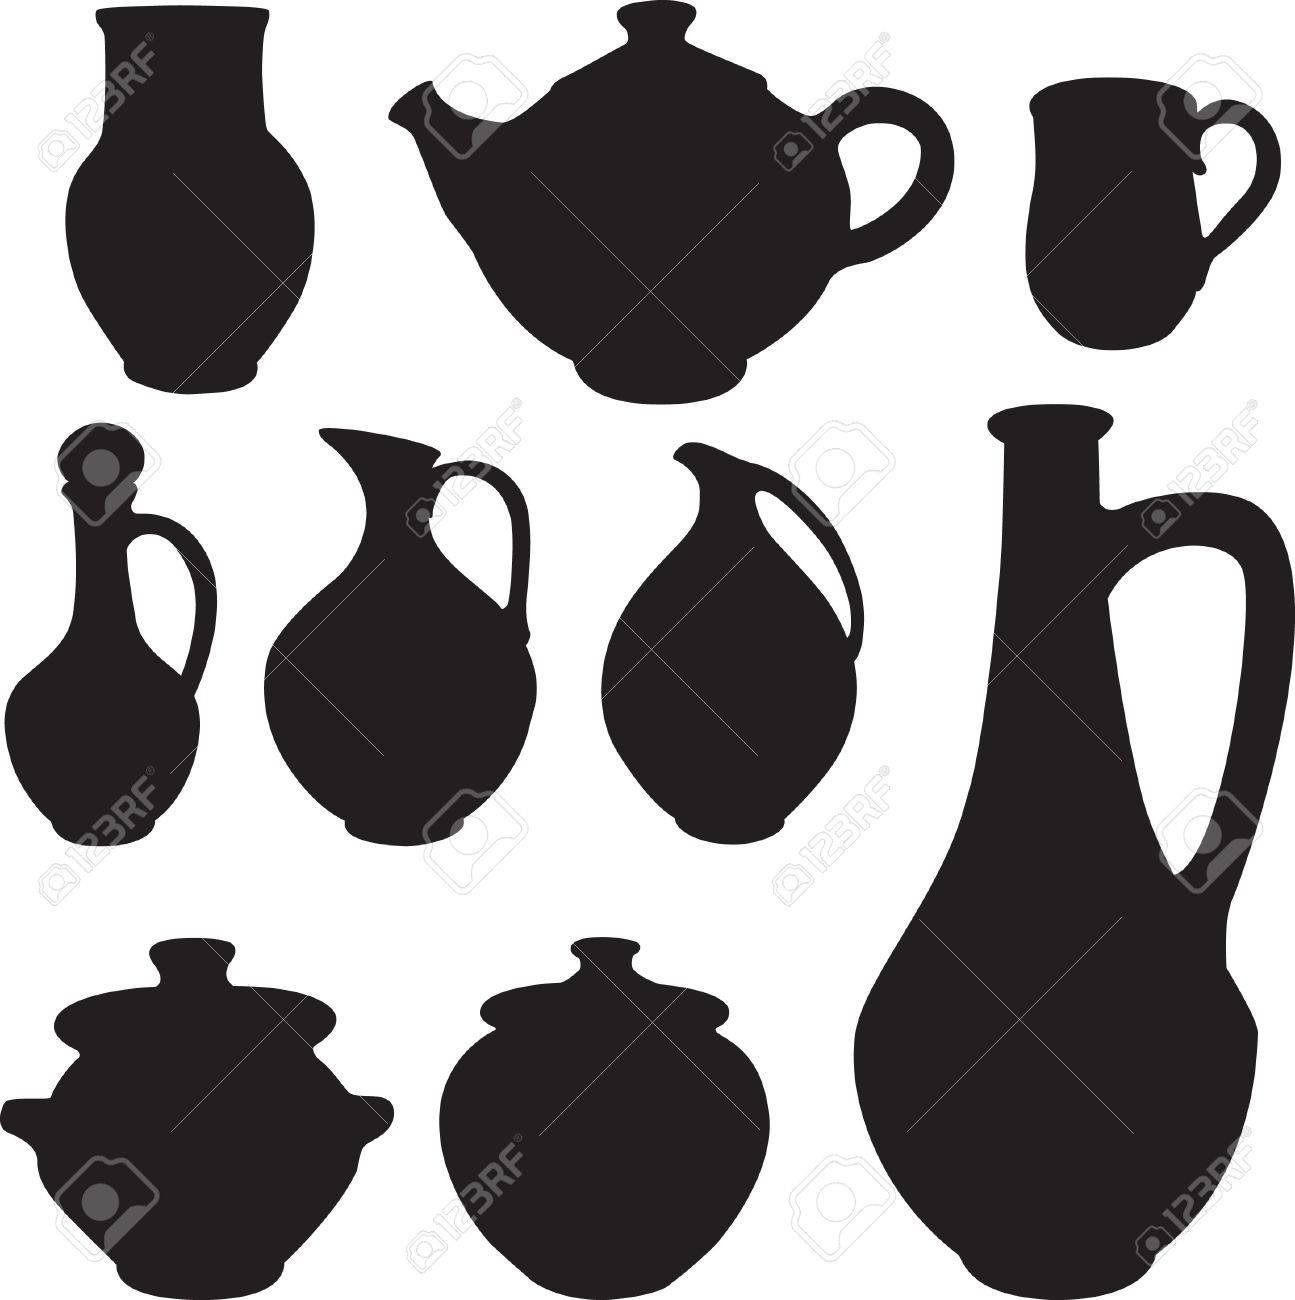 antique silhouette set ware. Stock Vector - 9295311